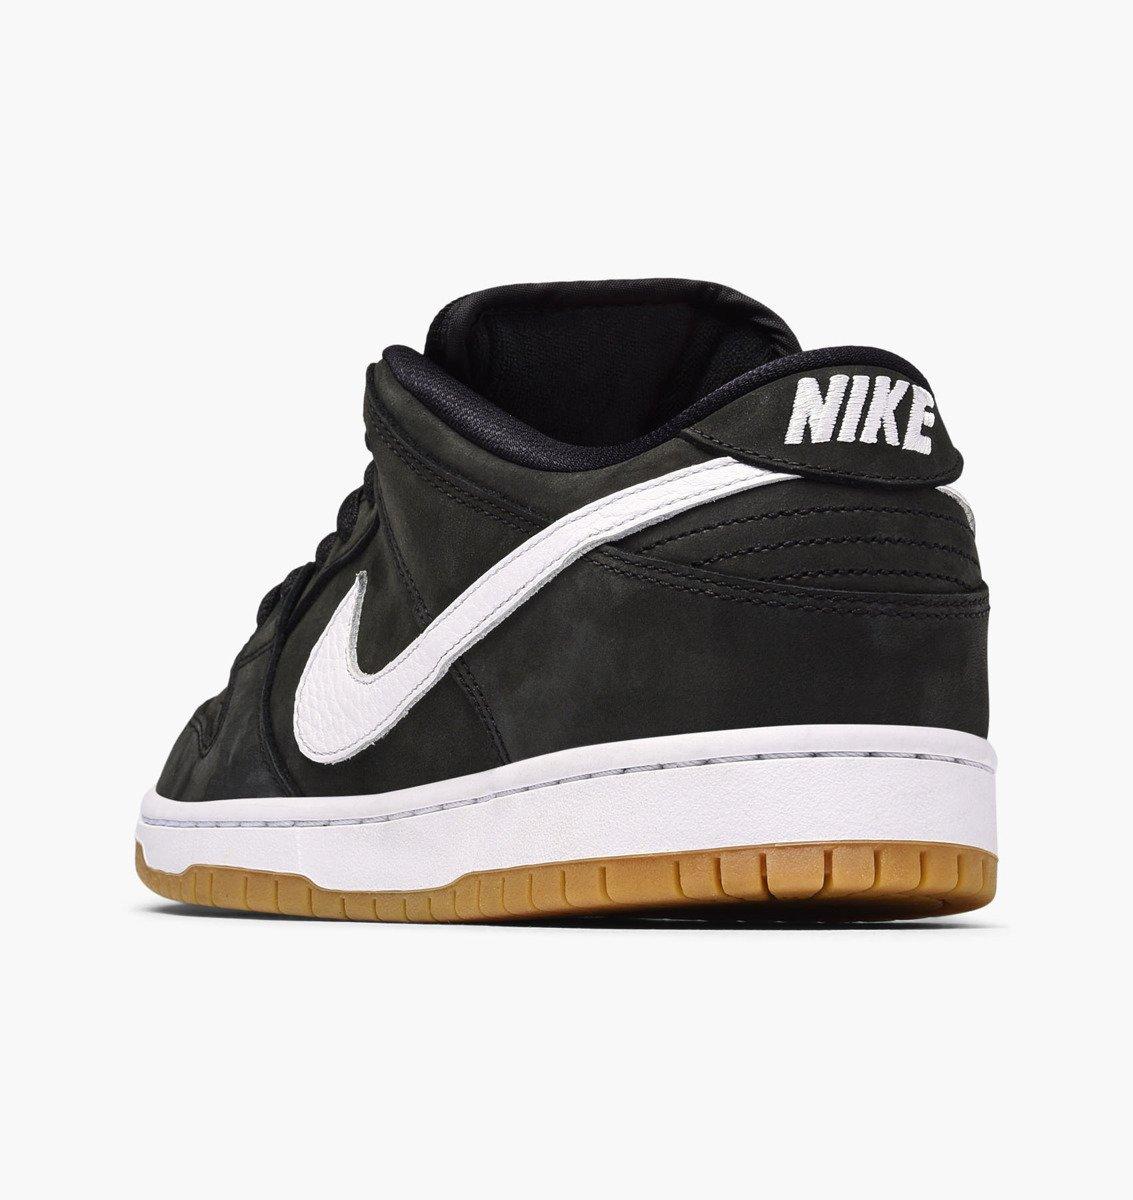 ... Nike Sb Dunk Low Pro Iso Black white-black Click to zoom ... f0993ebad